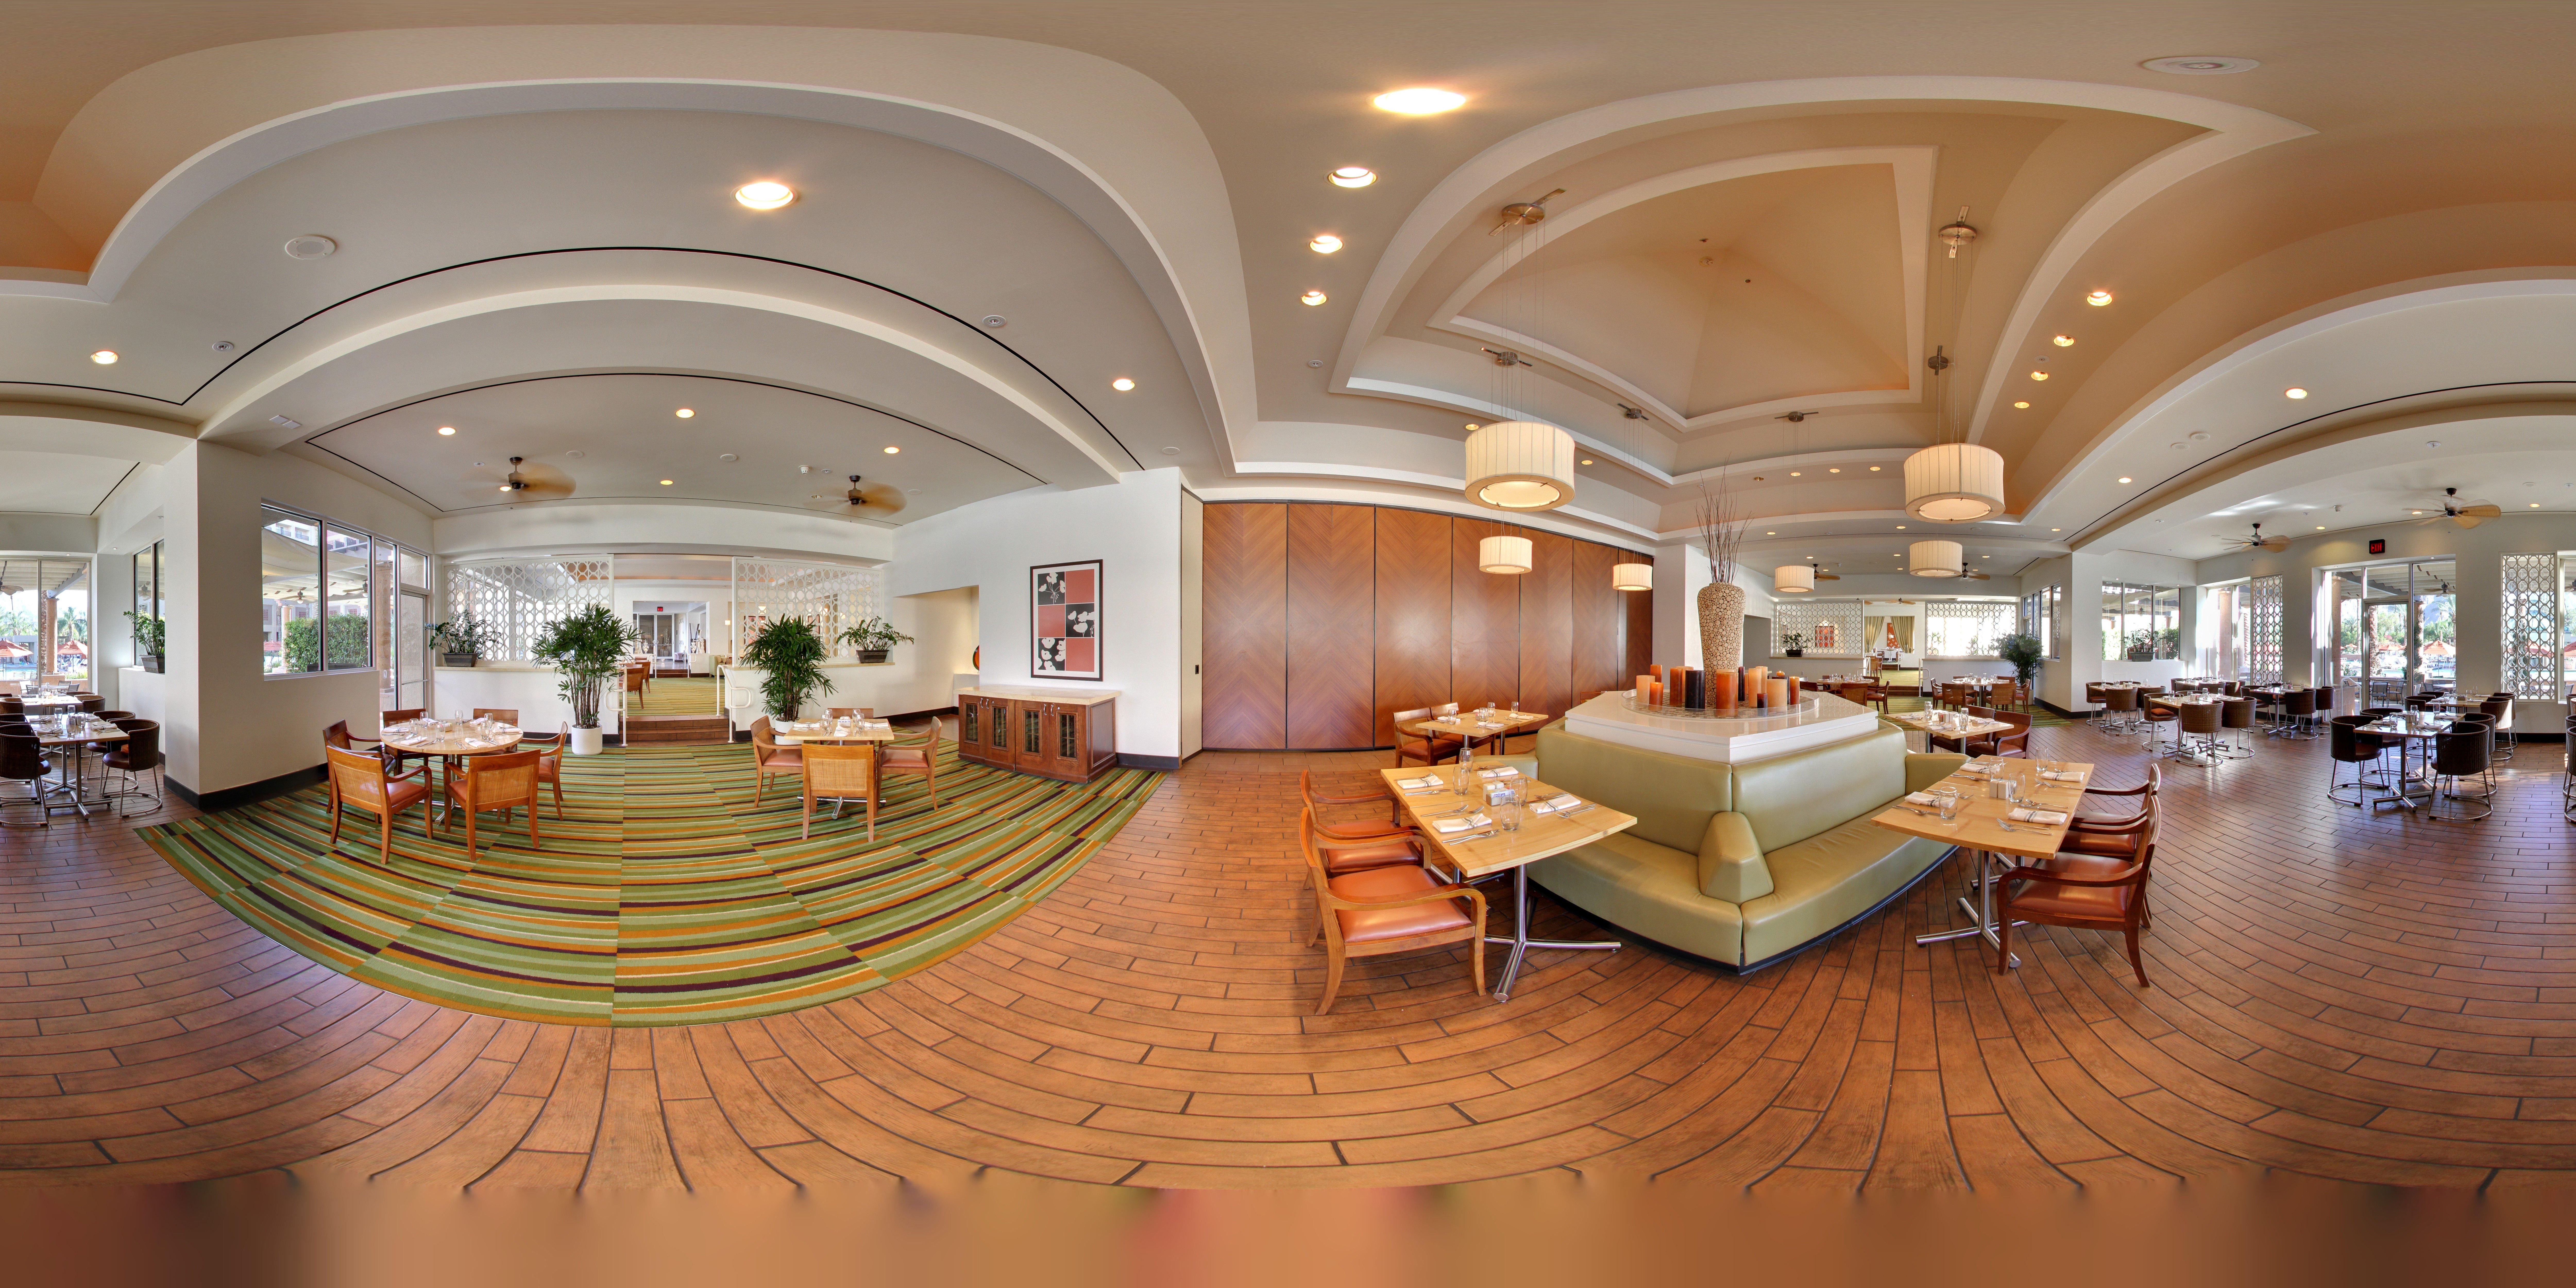 Renaissance Indian Wells Resort & Spa image 14